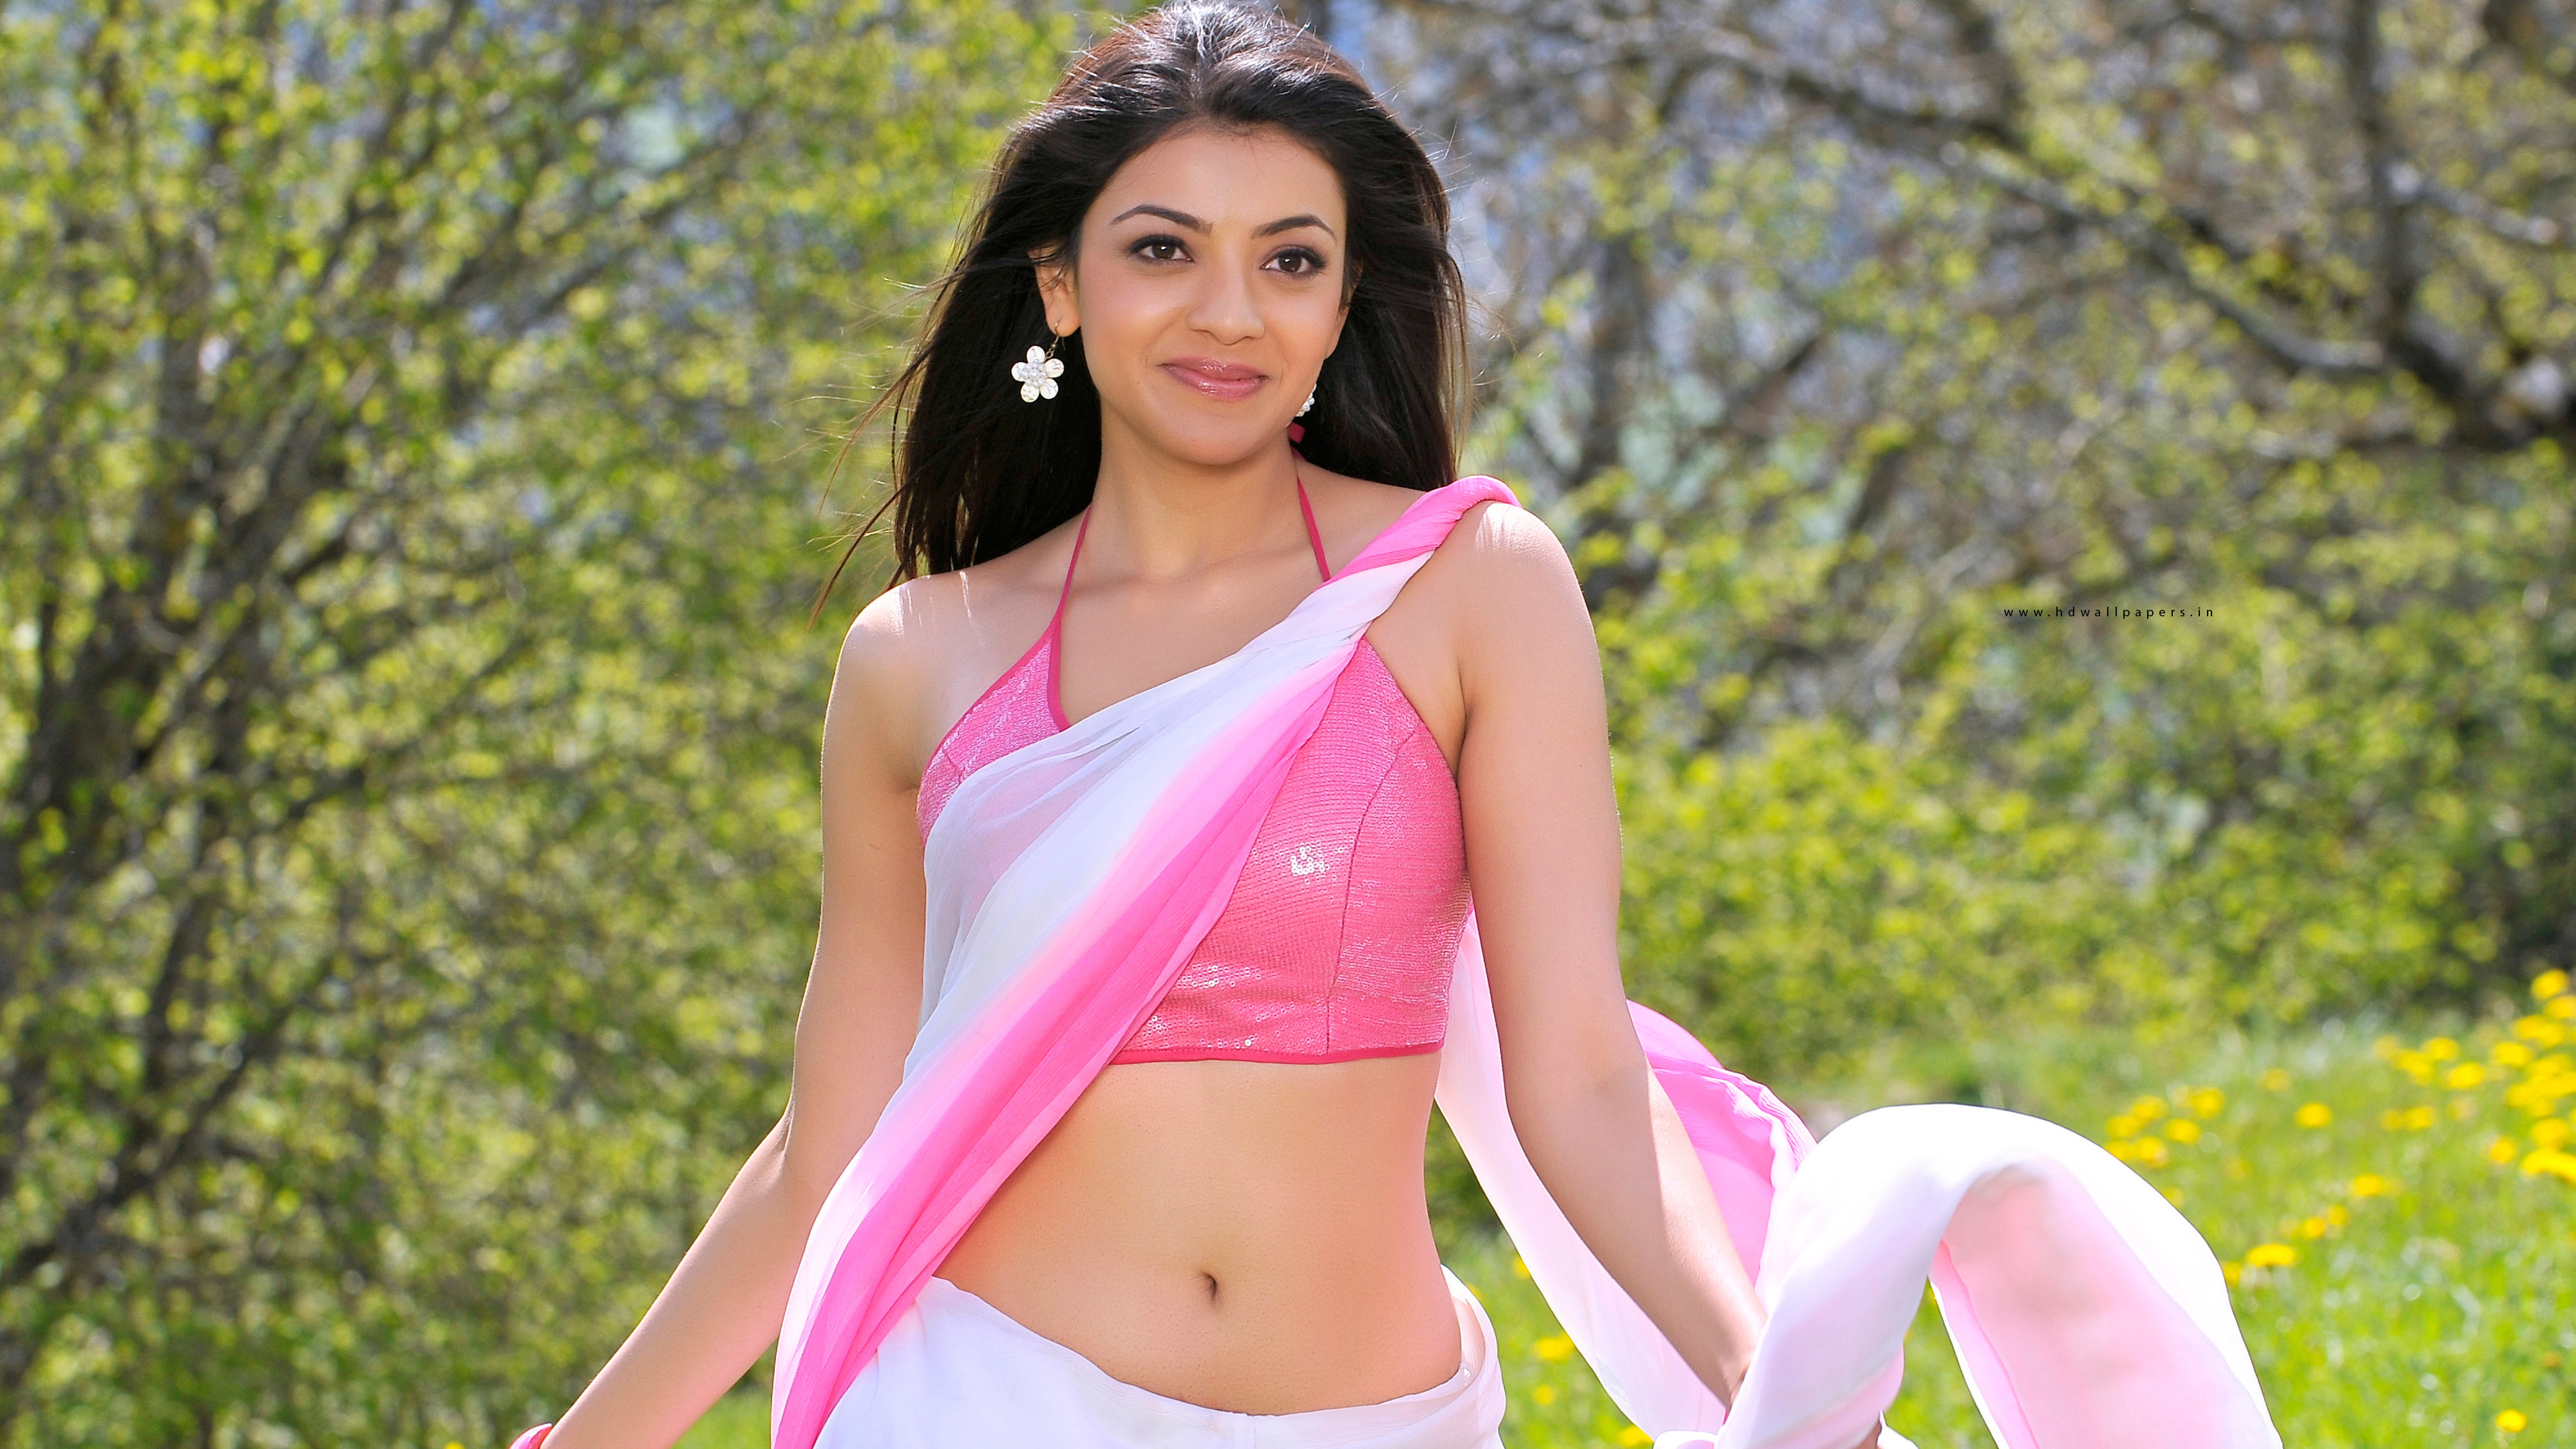 Kajal Agarwal Hot In Veera , HD Wallpaper & Backgrounds